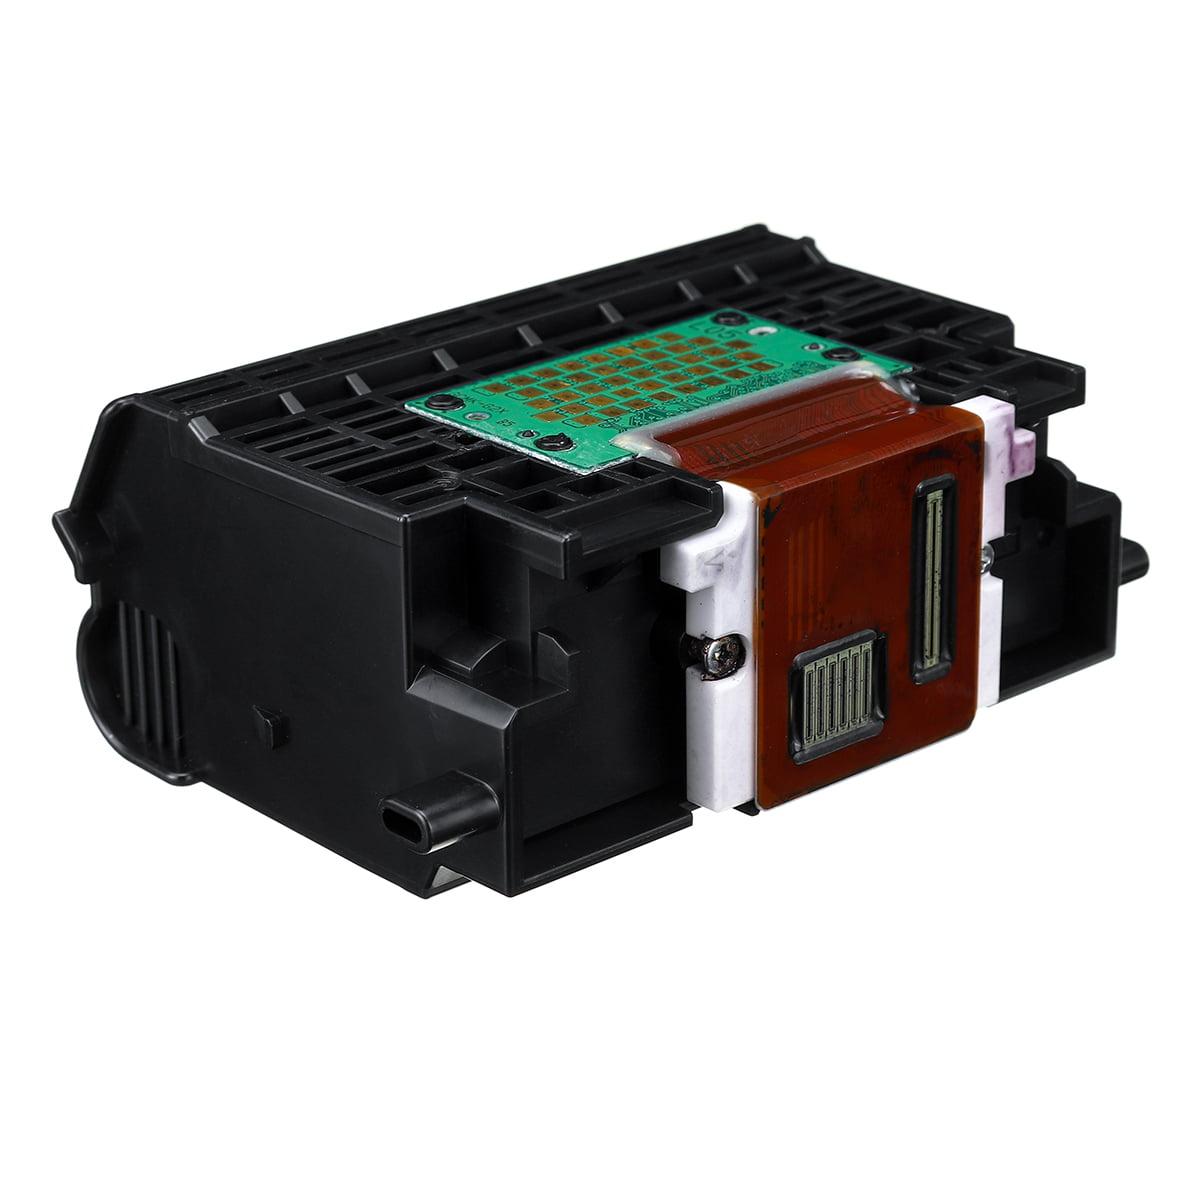 NEW Printhead For Canon QY6-0059 iP4200 MP500 MP530 Printer Accessories